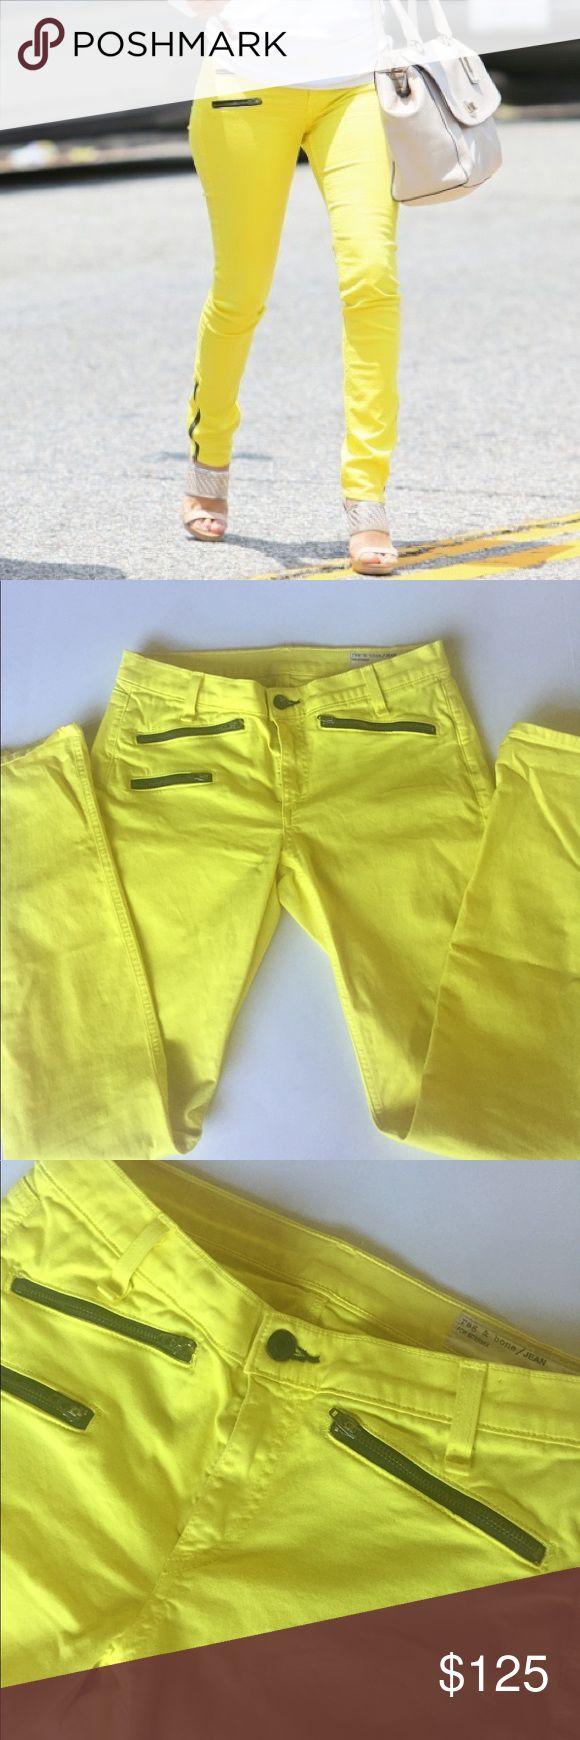 *rag & bone* Rag & bone yellow skinny jeans with black accent zippers in a size 27. Rise 8, inseam 29, waist 15 rag & bone Jeans Skinny